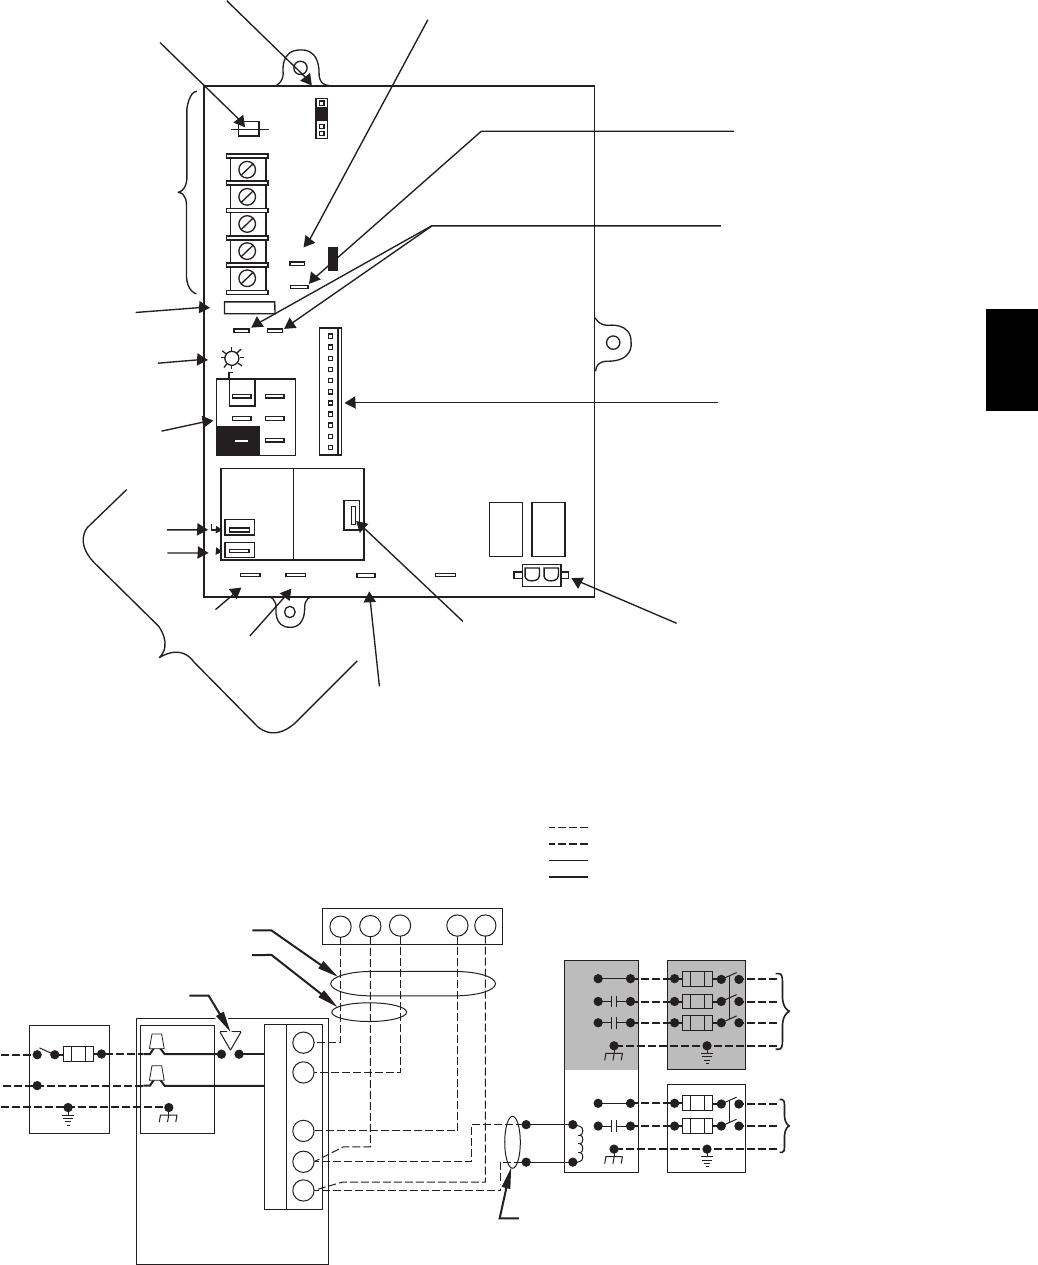 Bryant Furnace Bryant Furnace Wiring Diagram